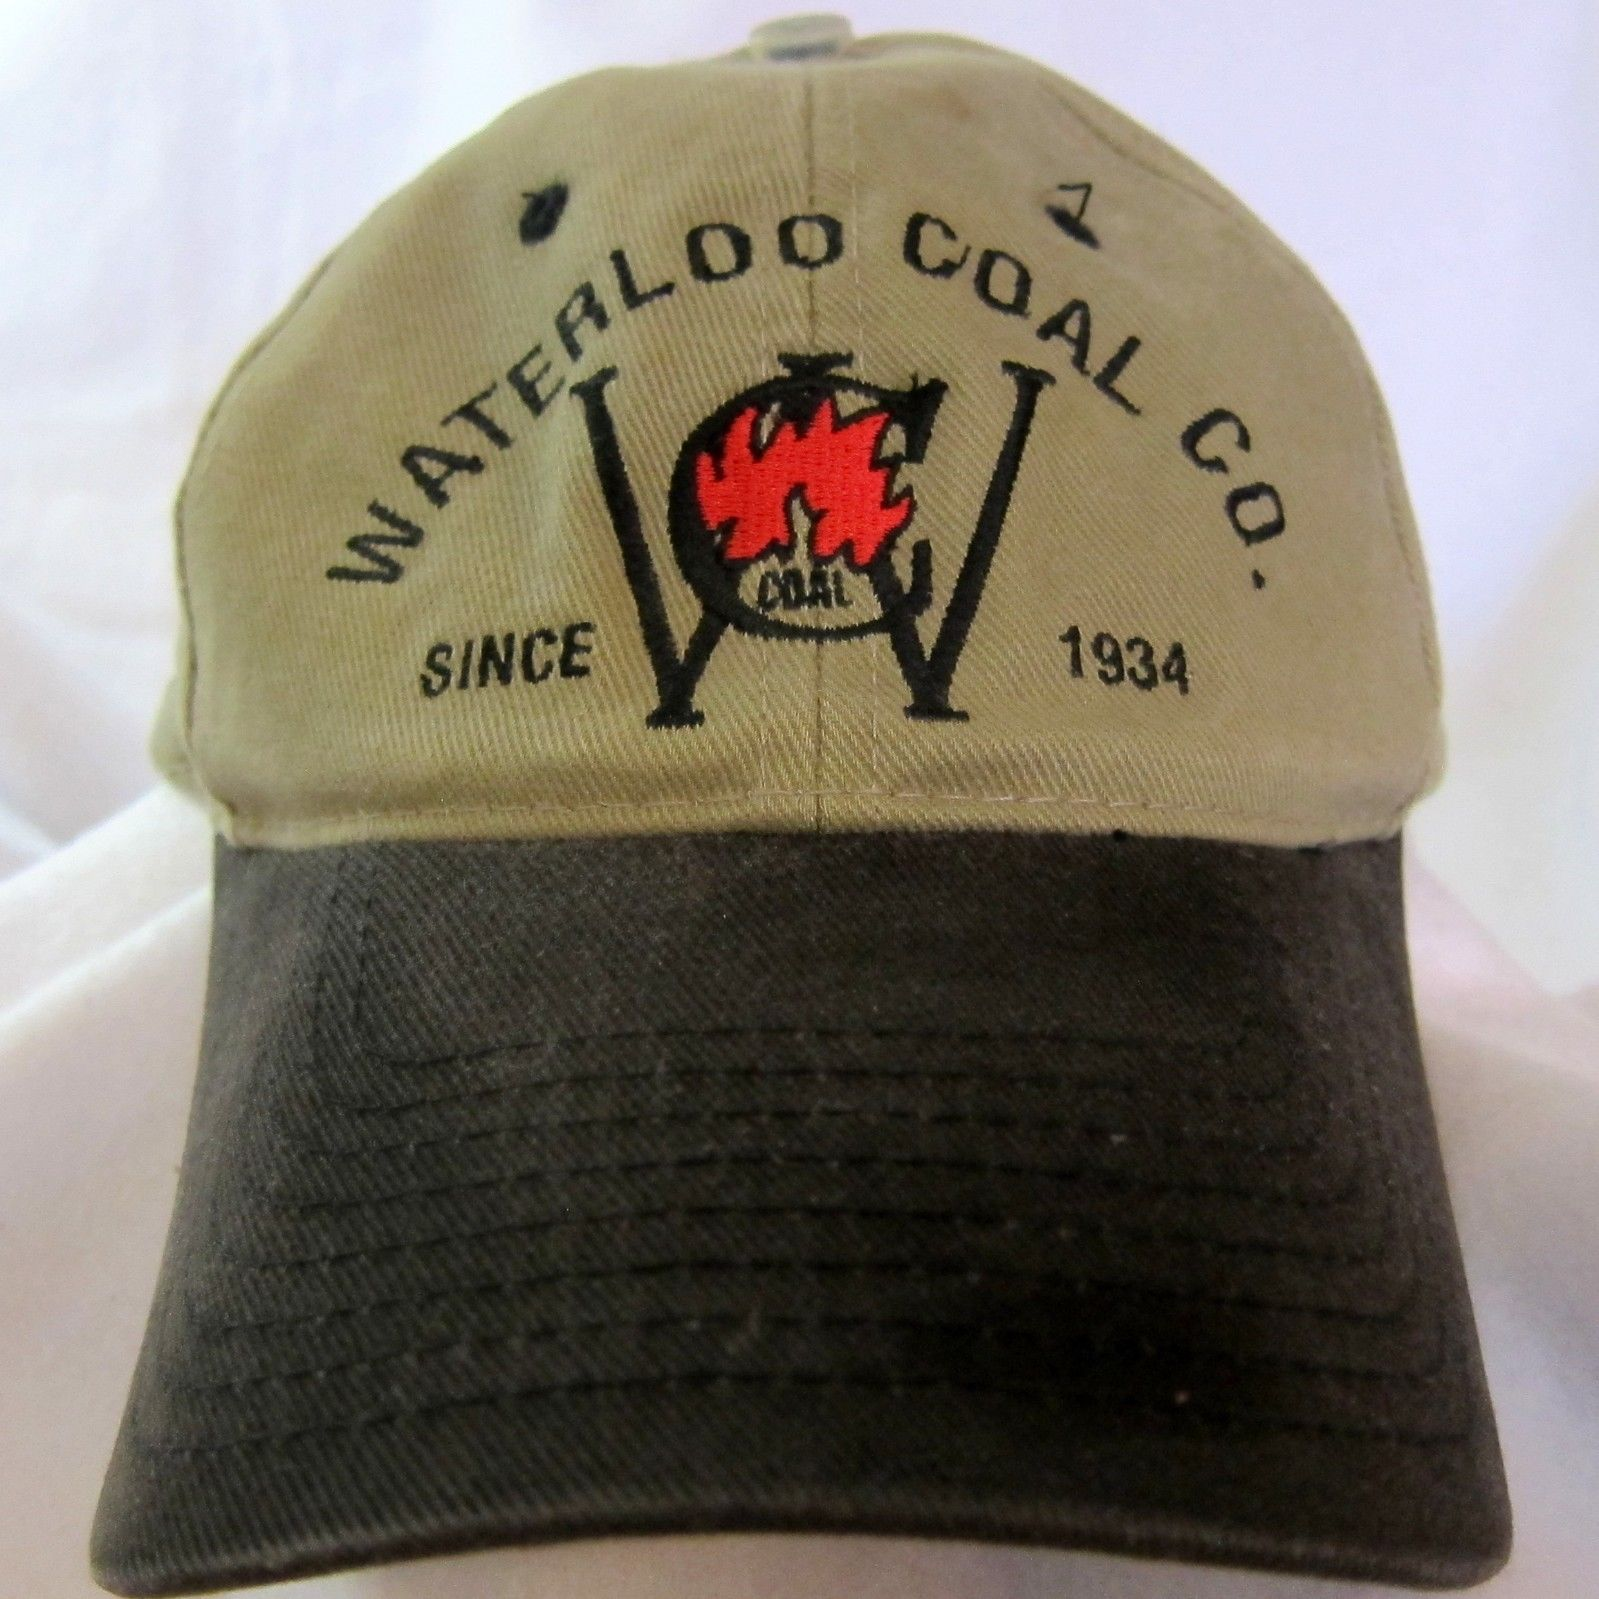 532e5dbf4 Waterloo Coal Company Since 1934 Adj Strapback Hat Ball Cap Cotton Khaki  Black -  24.74